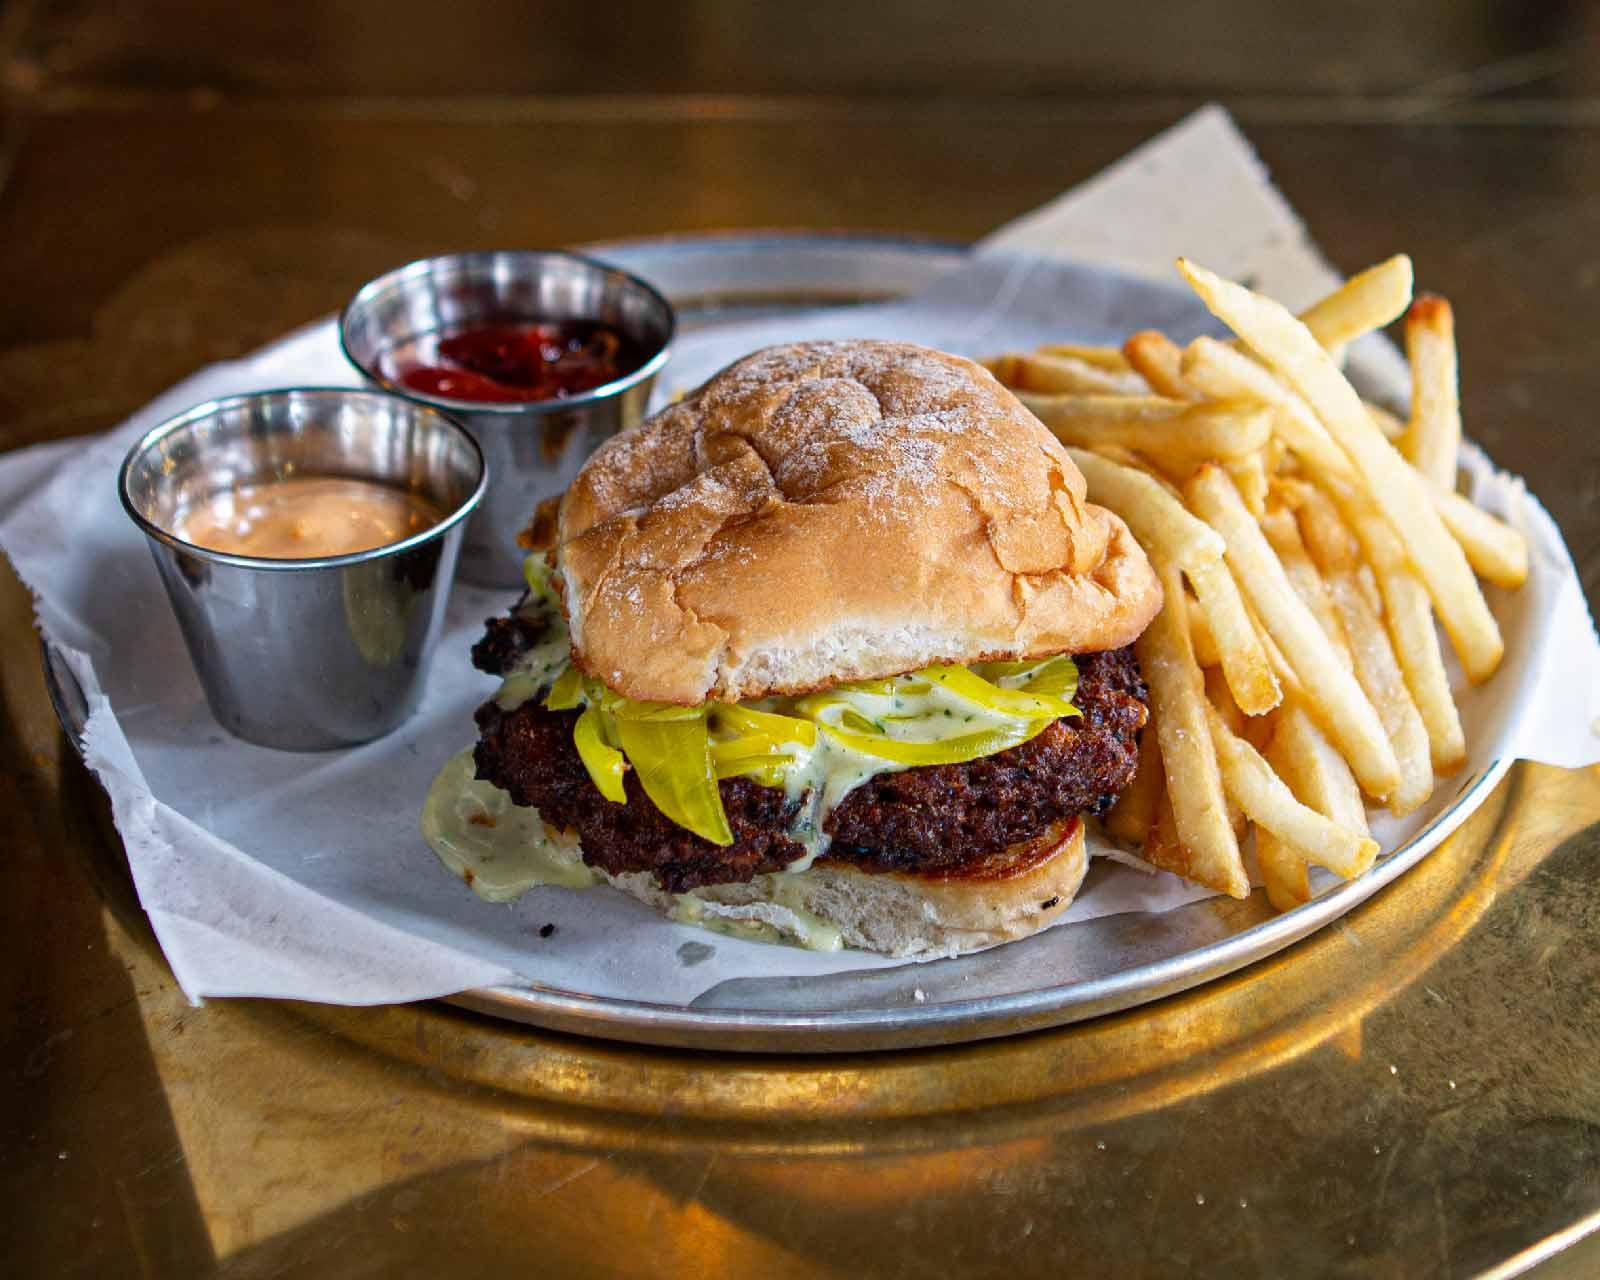 Prit' Near veggie burger